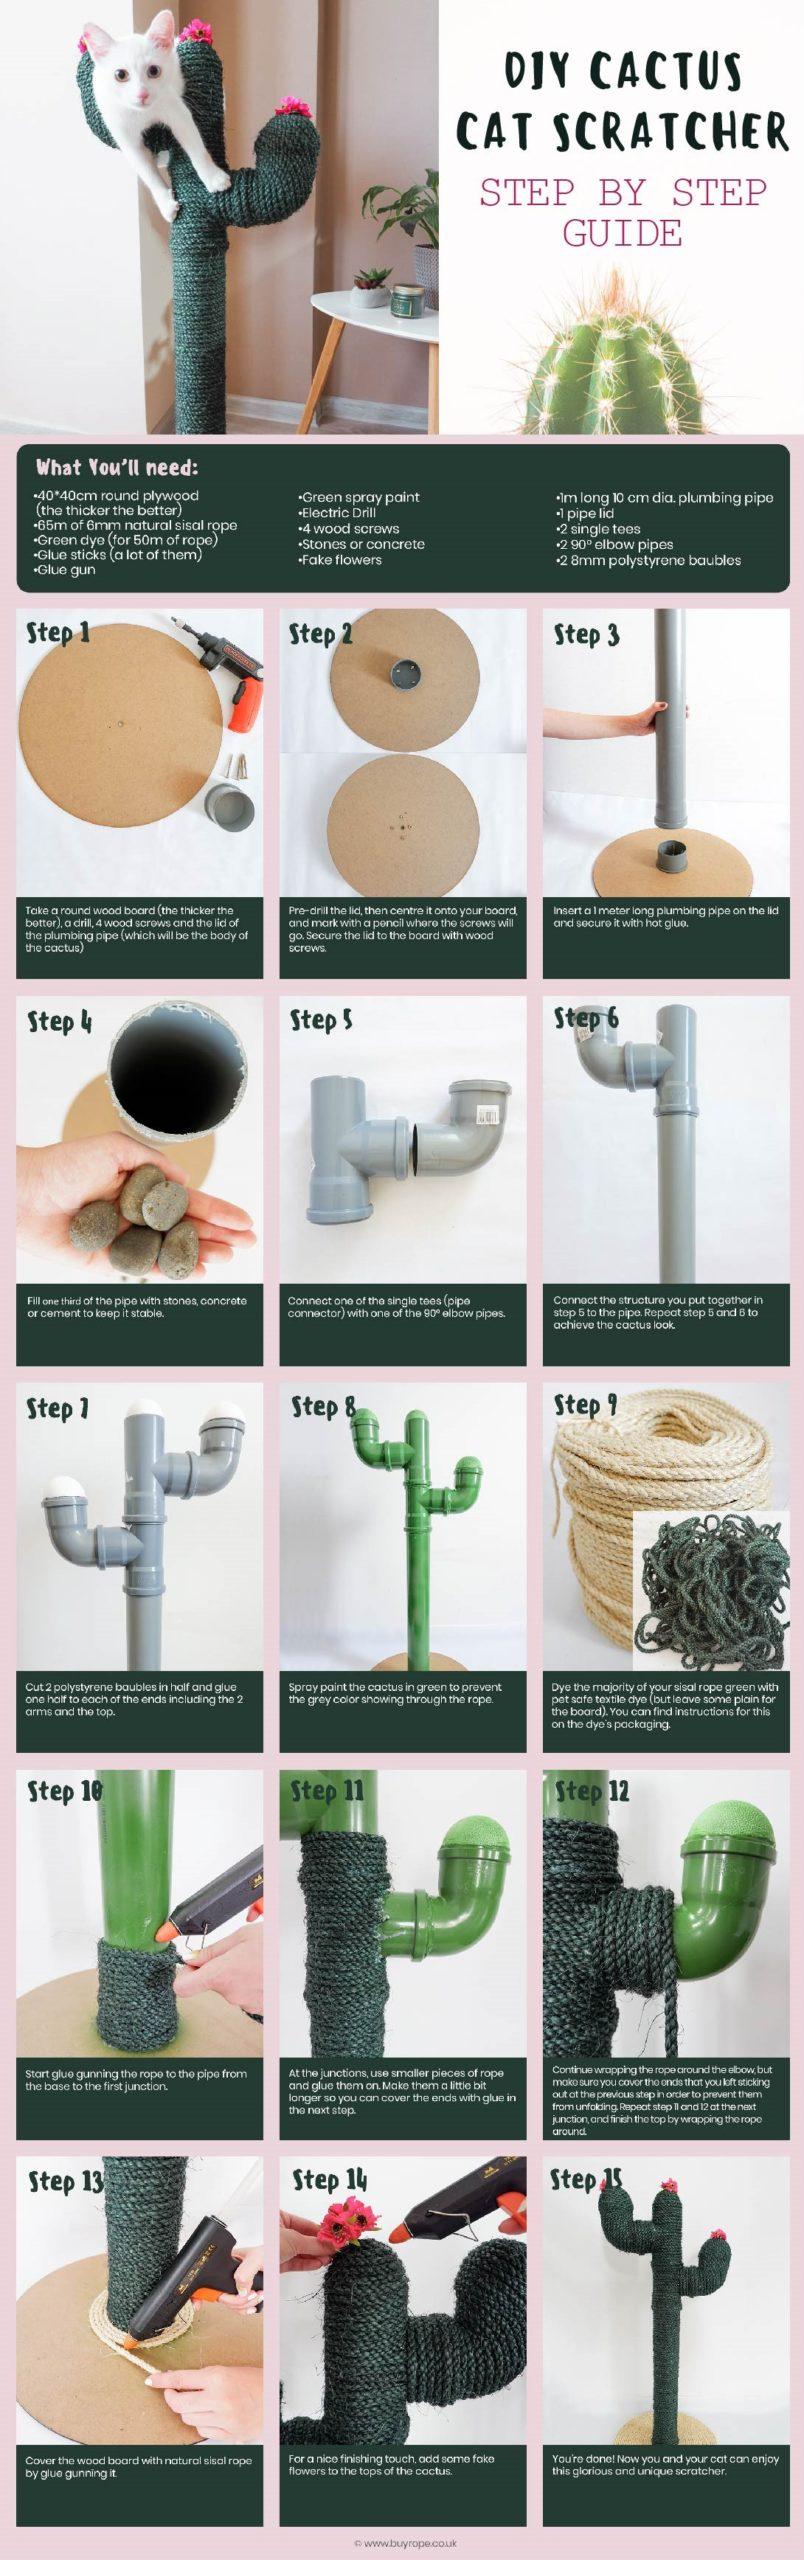 How to make a cactus cat scratcher